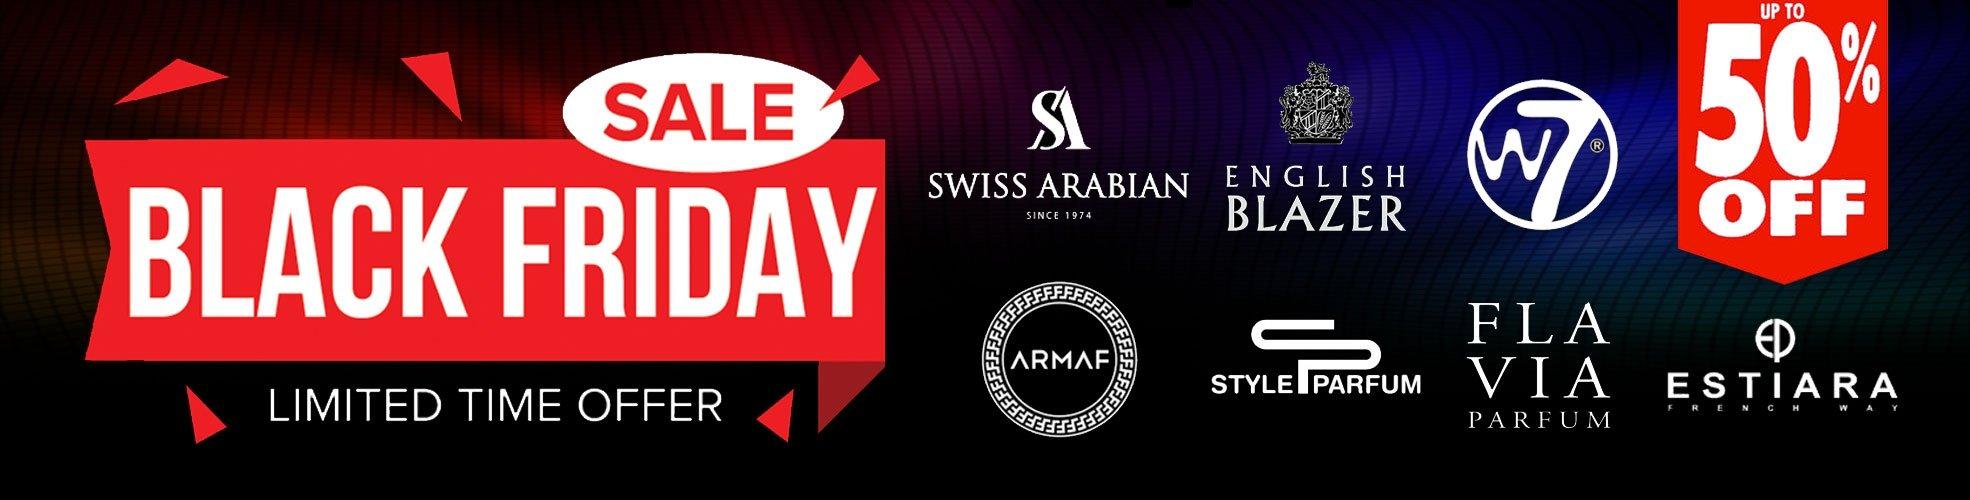 Buy now heavily discounted wholesale perfume and cosmetics. Armaf, Estiara, Flavia, Sapil, Swiss Arabian, Cosmo, W7 and English Blazer.